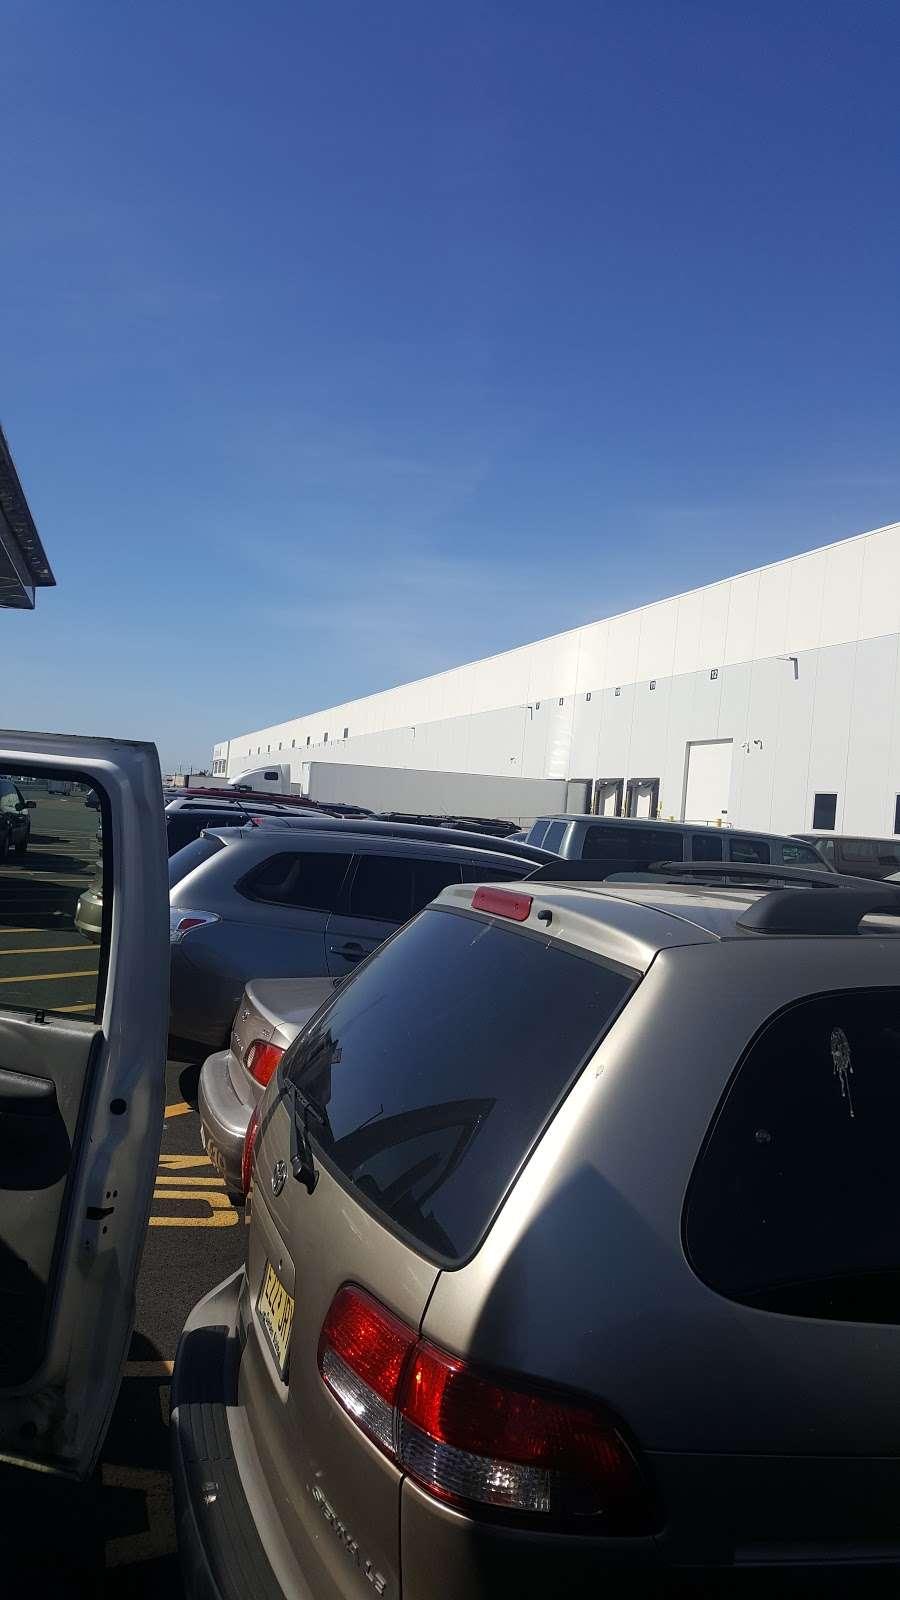 Luso Transport Co - moving company  | Photo 1 of 1 | Address: 169 Blanchard St, Newark, NJ 07105, USA | Phone: (973) 522-0028